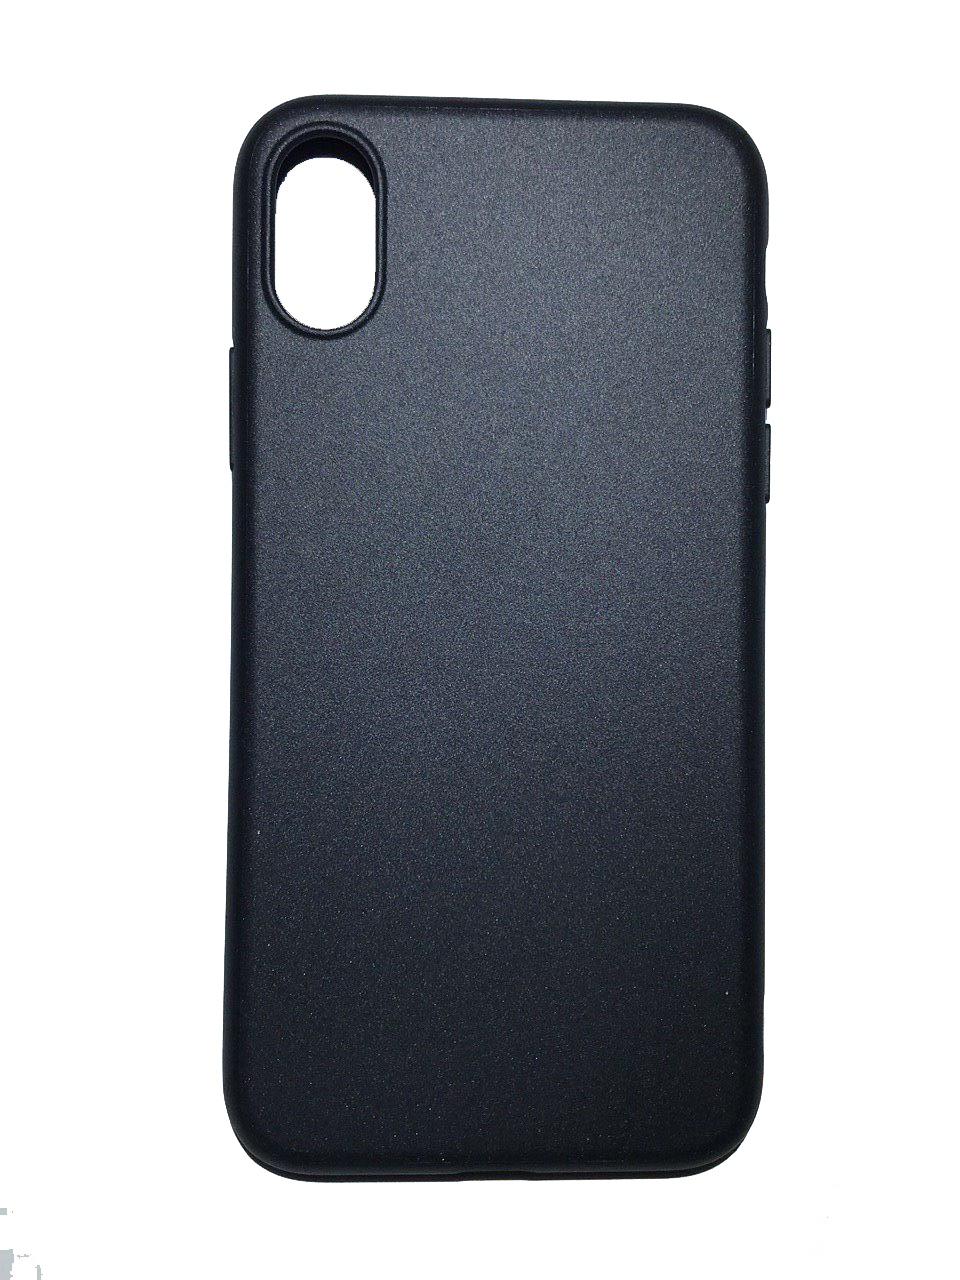 Чехол для сотового телефона Benks Чехол for iPhone X силикон (Black), черный glare free screen protector with cleaning cloth for iphone 3g